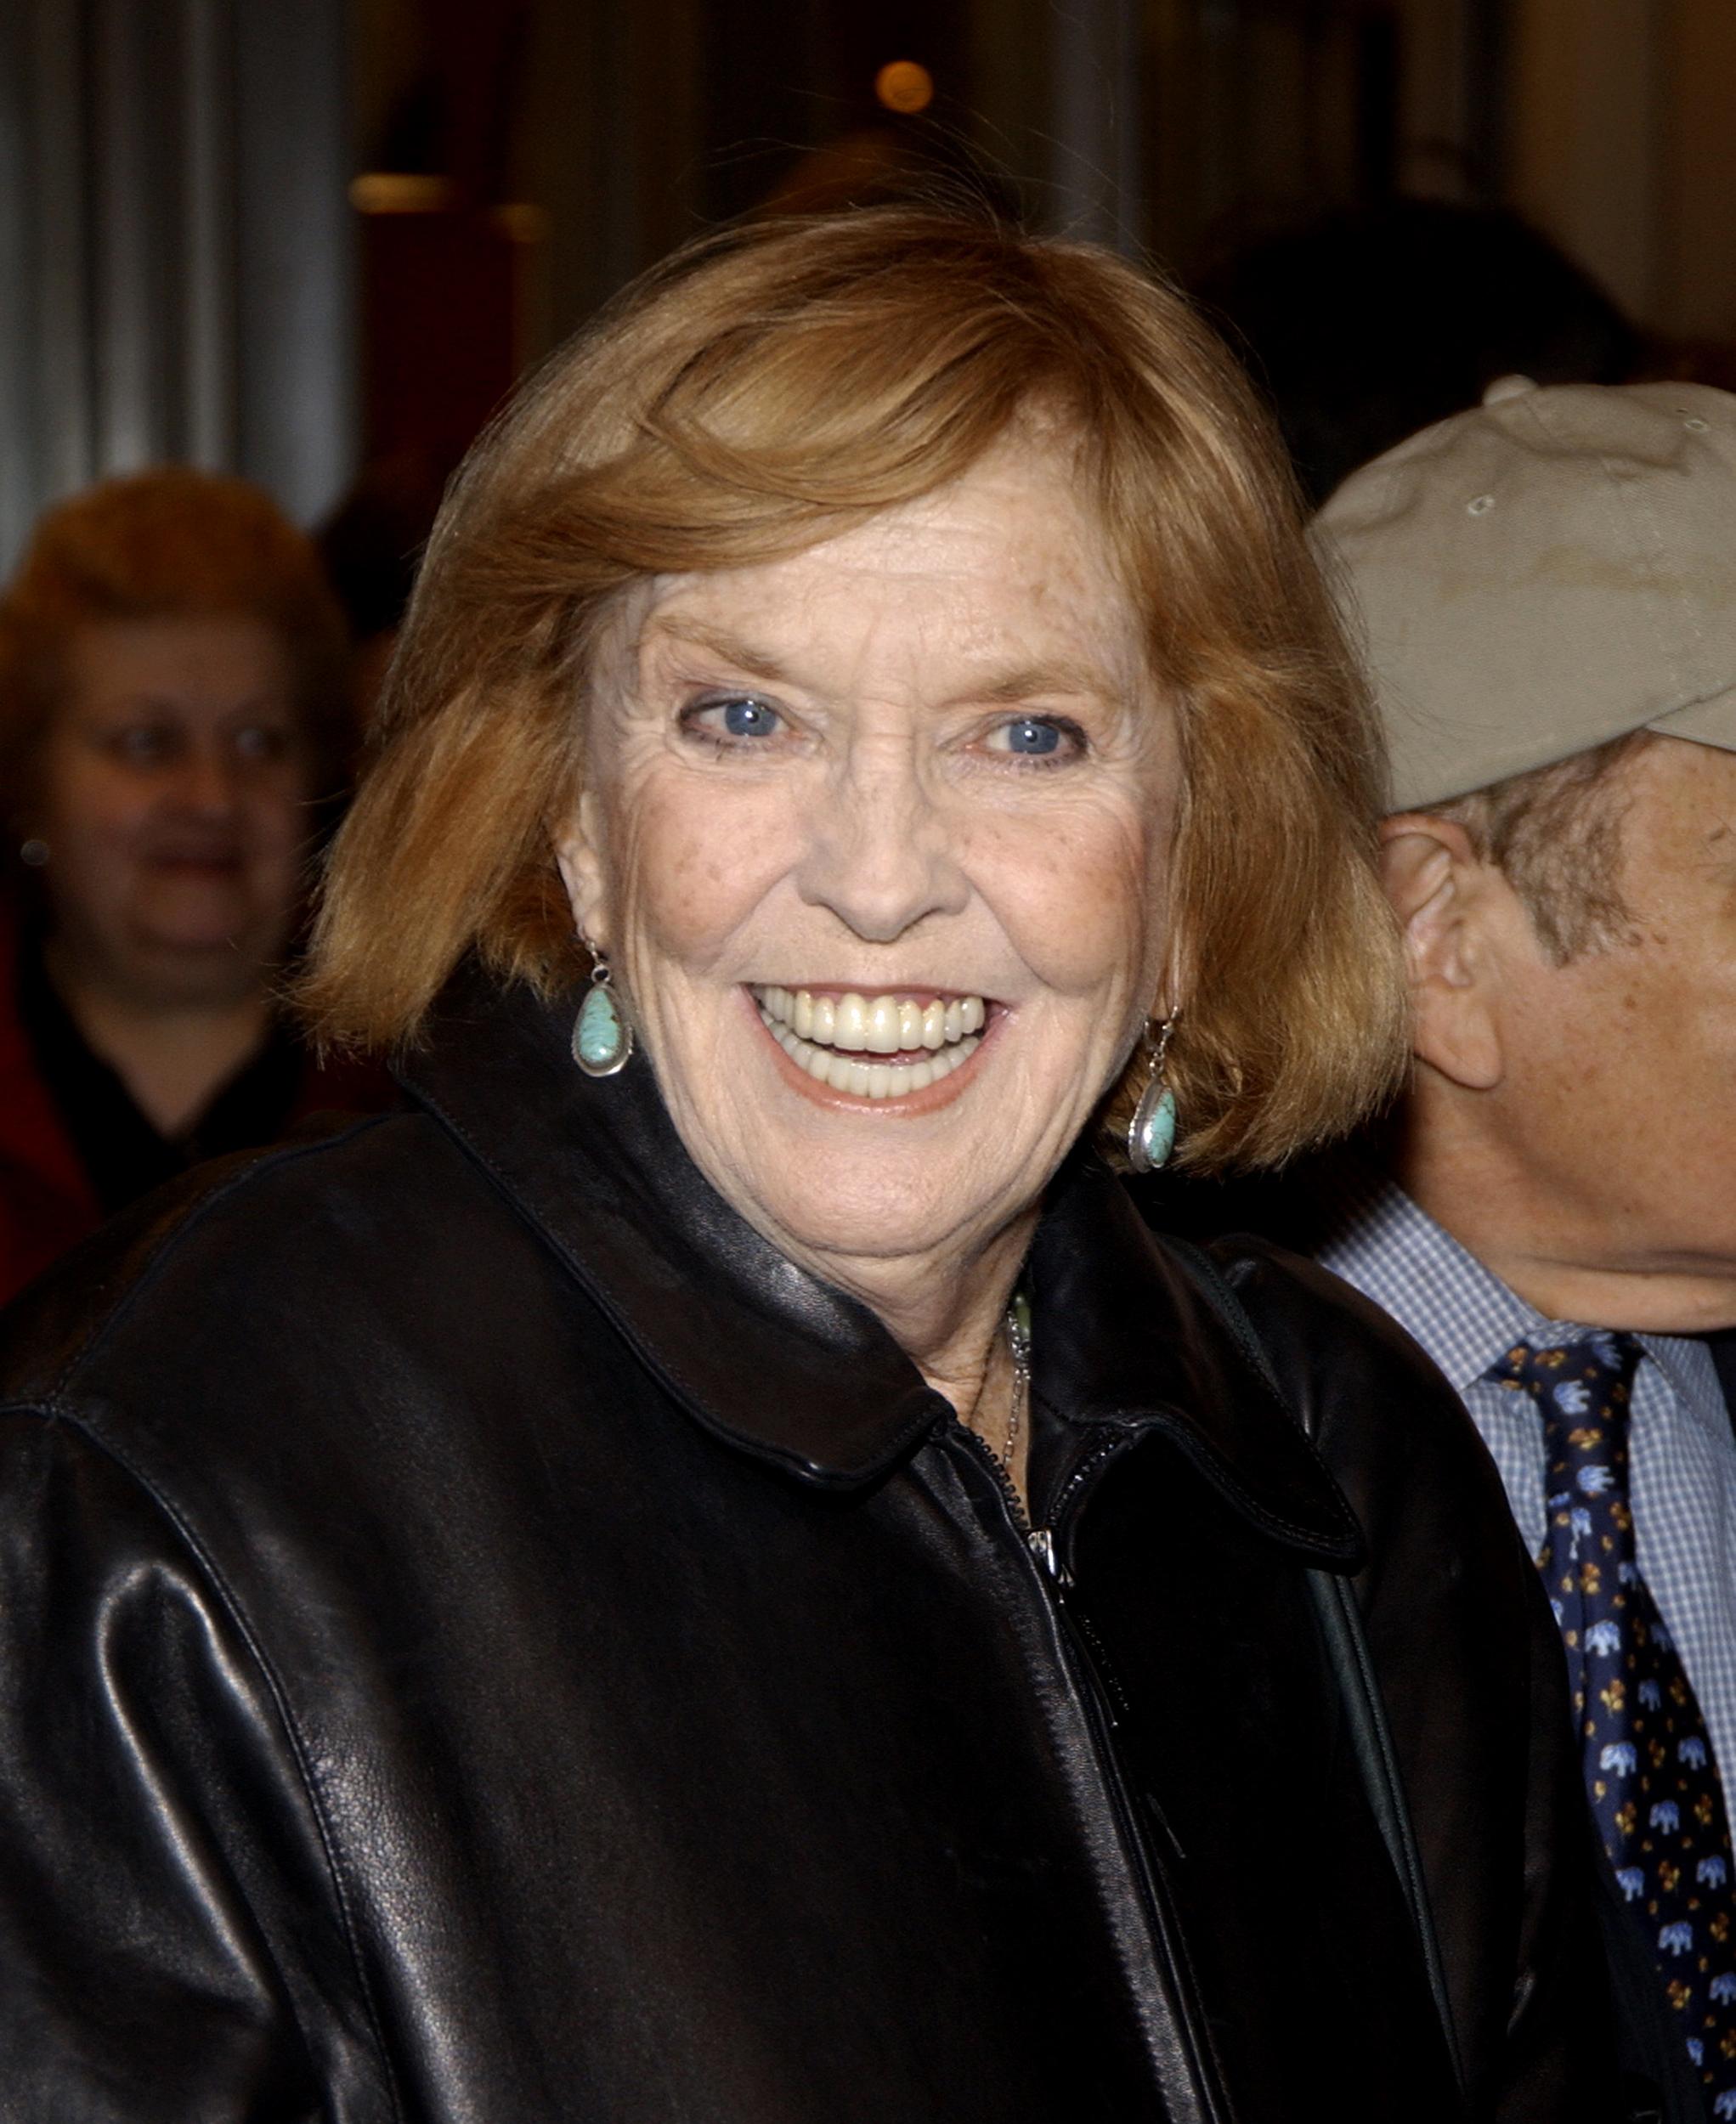 Actress And Comedian Anne Meara, Mom Of Ben Stiller, Dies